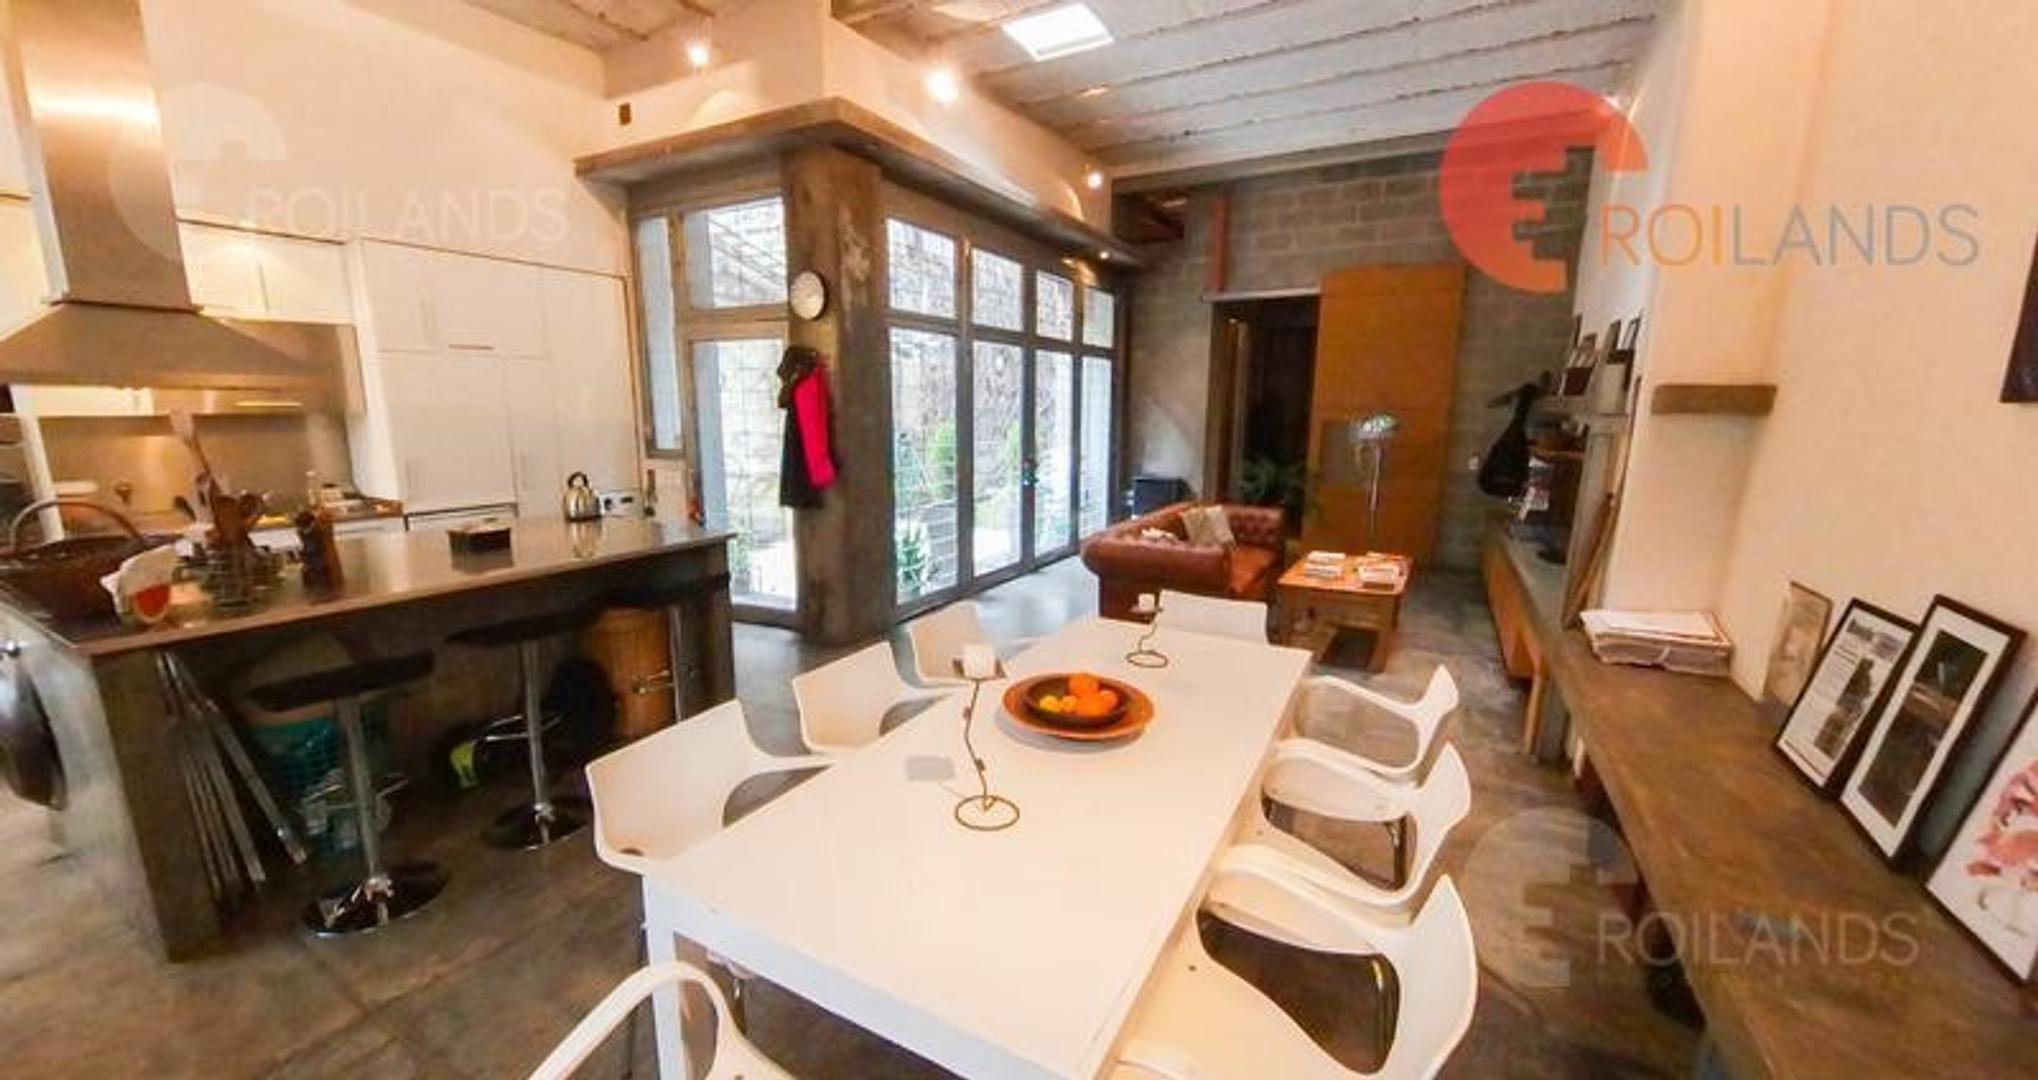 Ph - 147 m² | 2 dormitorios | Con terraza